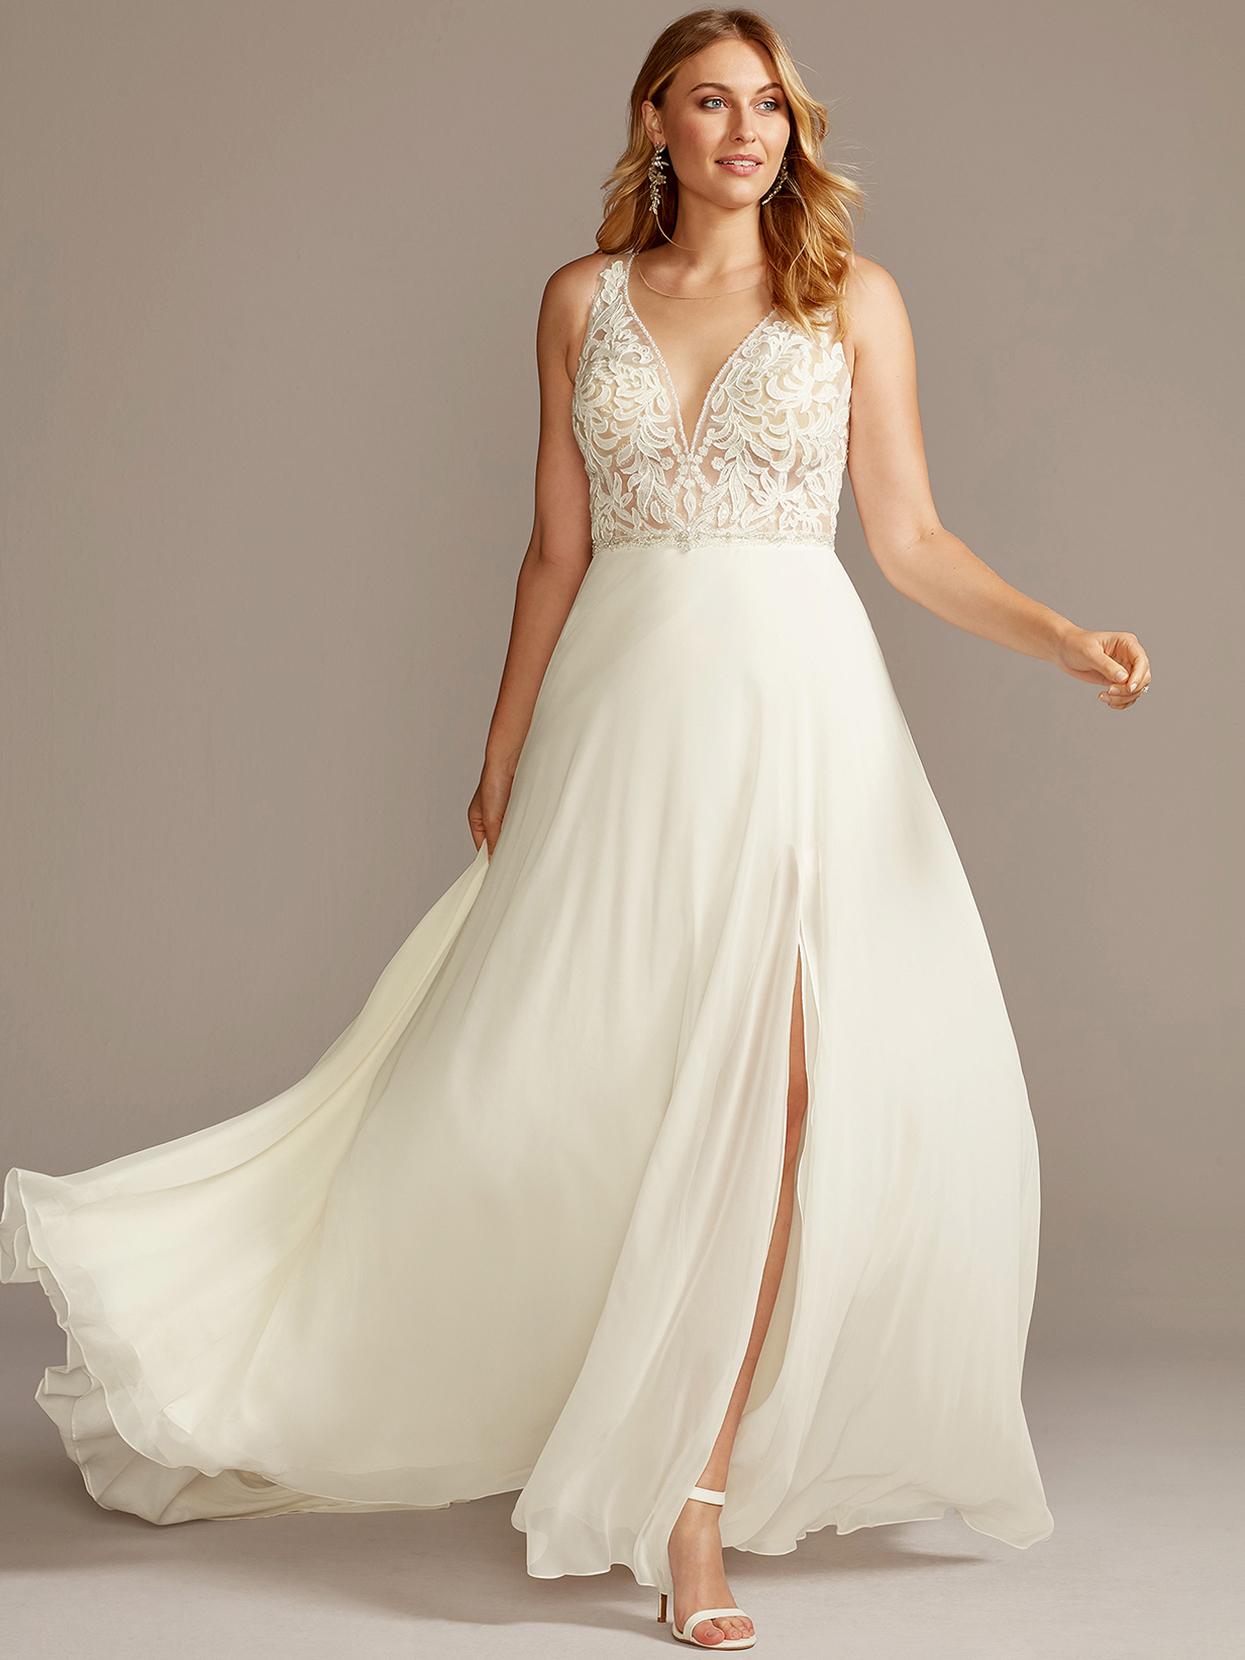 davids bridal galina v-neck a-line with slit wedding dress fall 2020